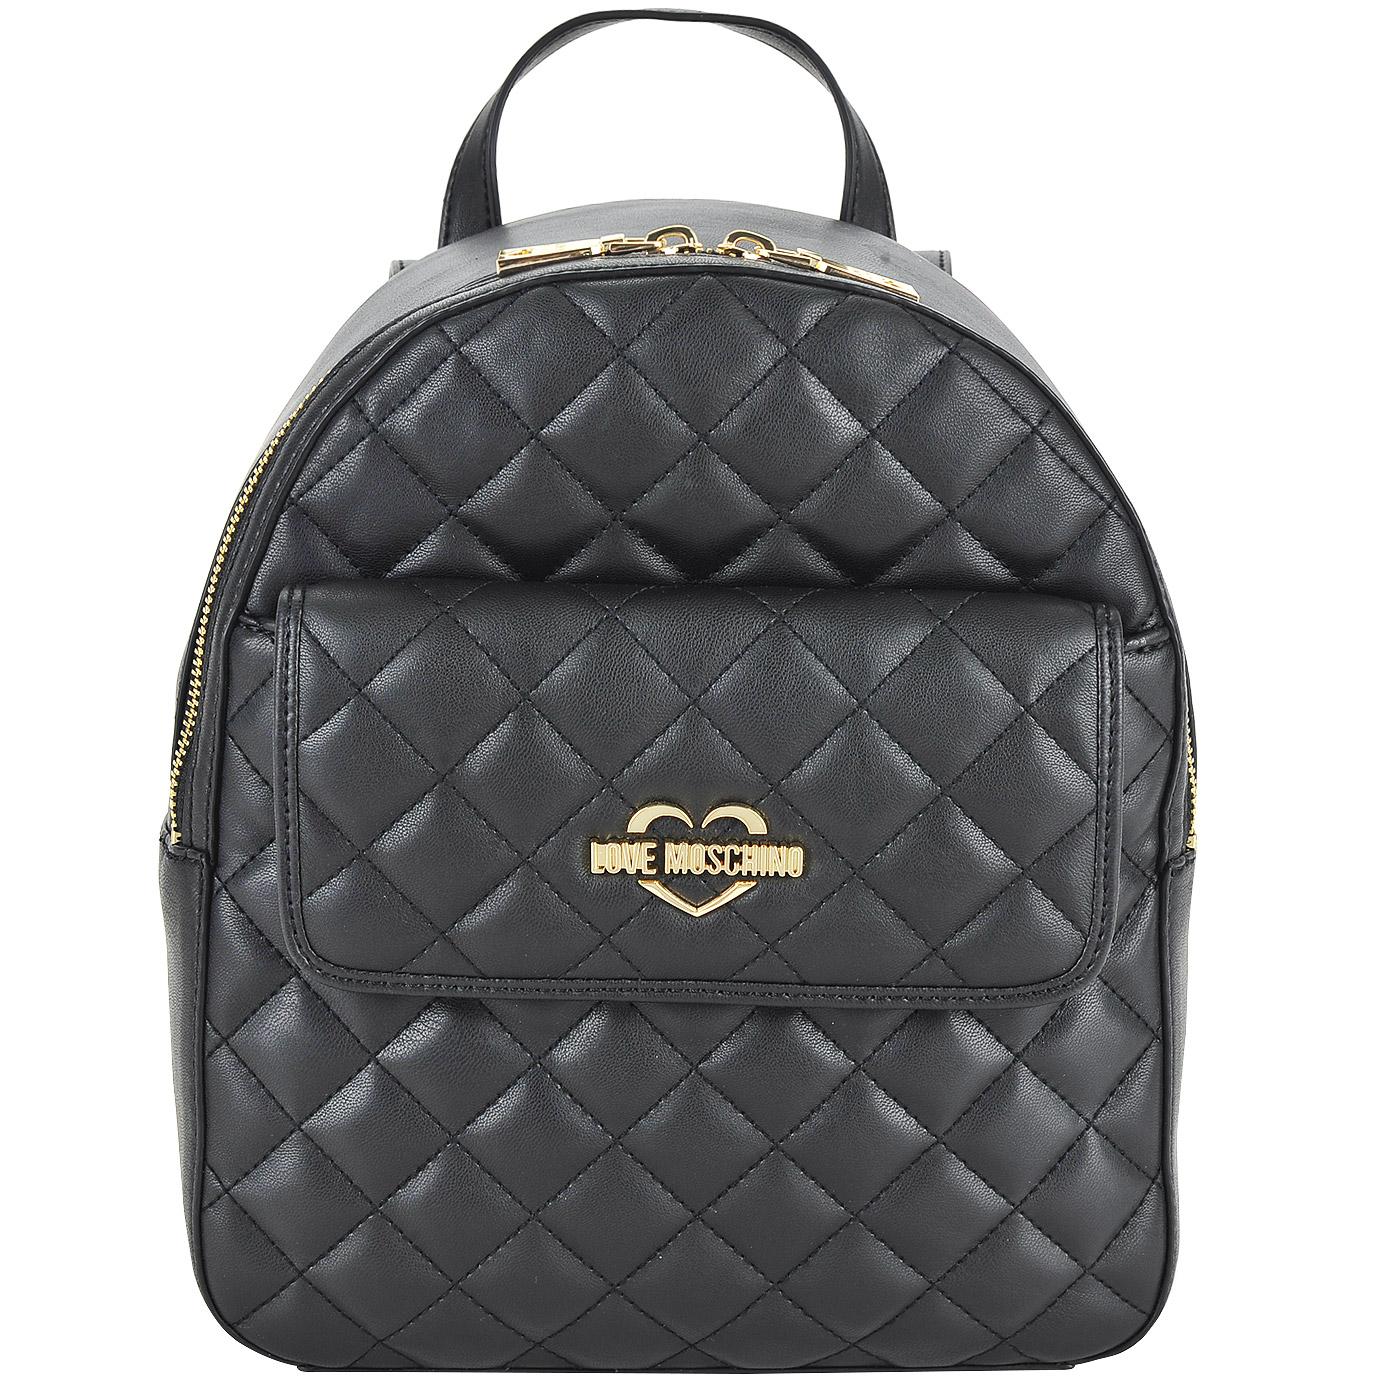 550d041704eb Женский стеганый рюкзак черного цвета Love Moschino Fashion Quilted ...